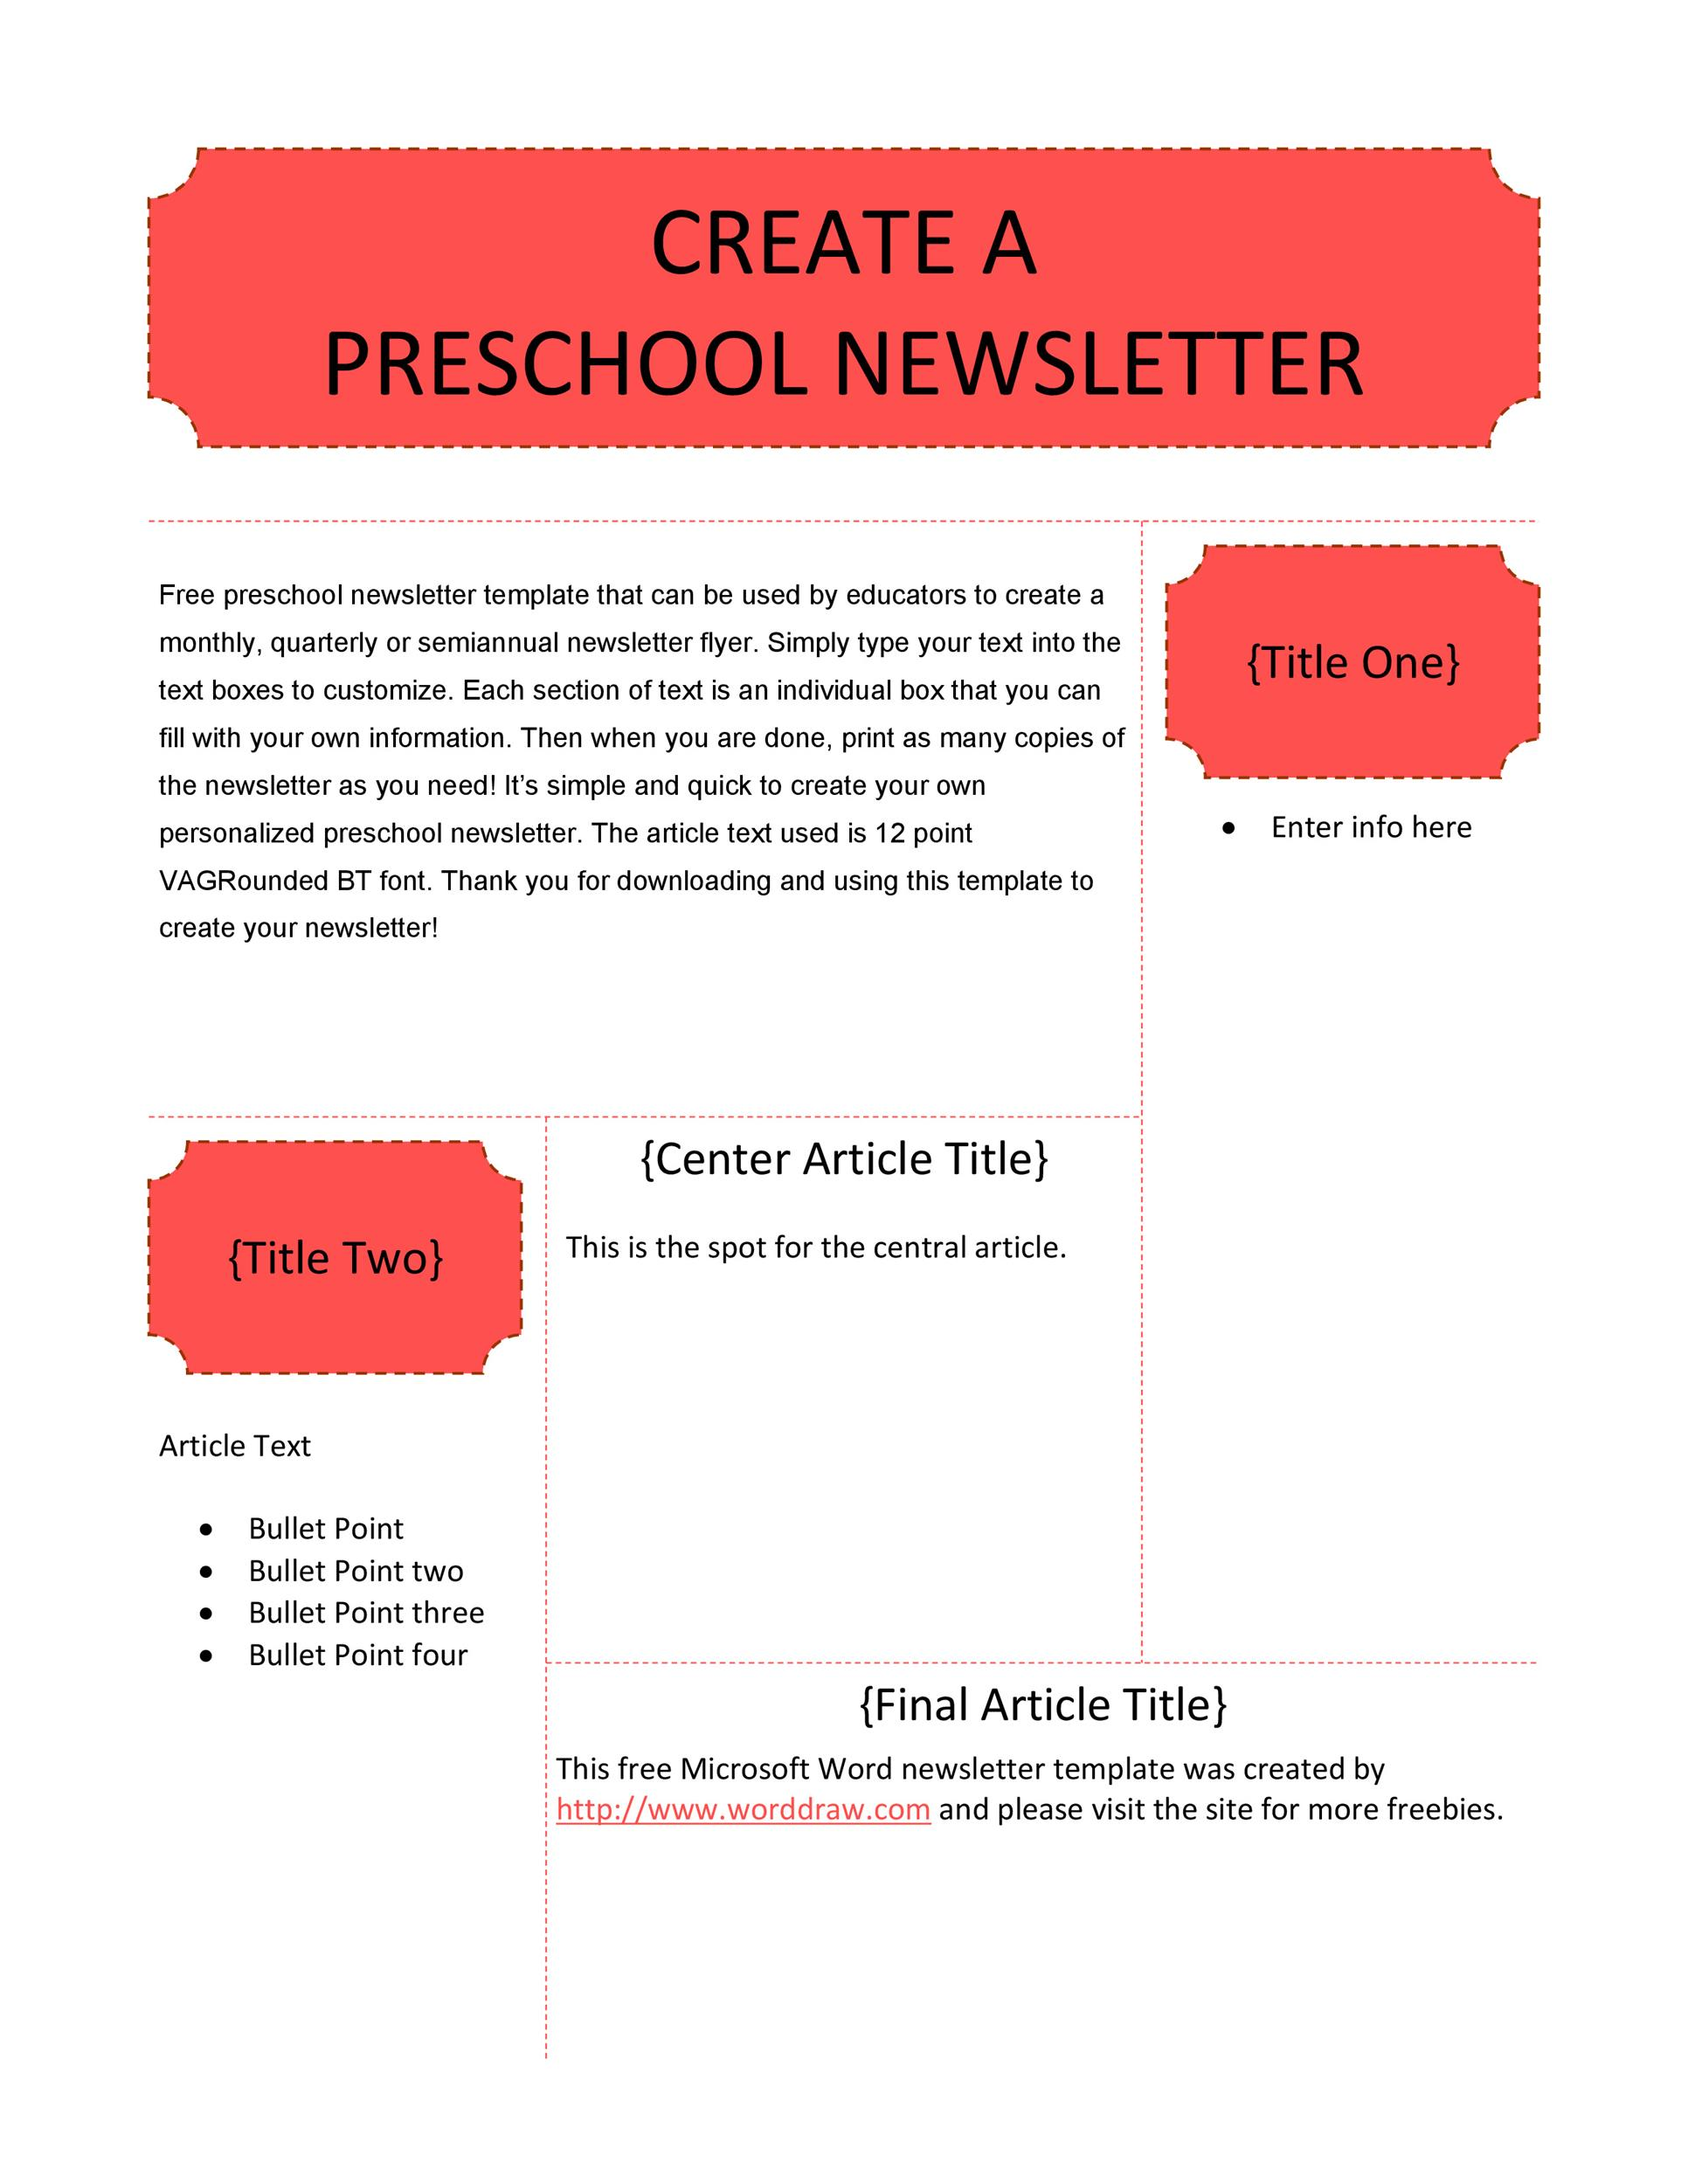 Free preschool newsletter template 08